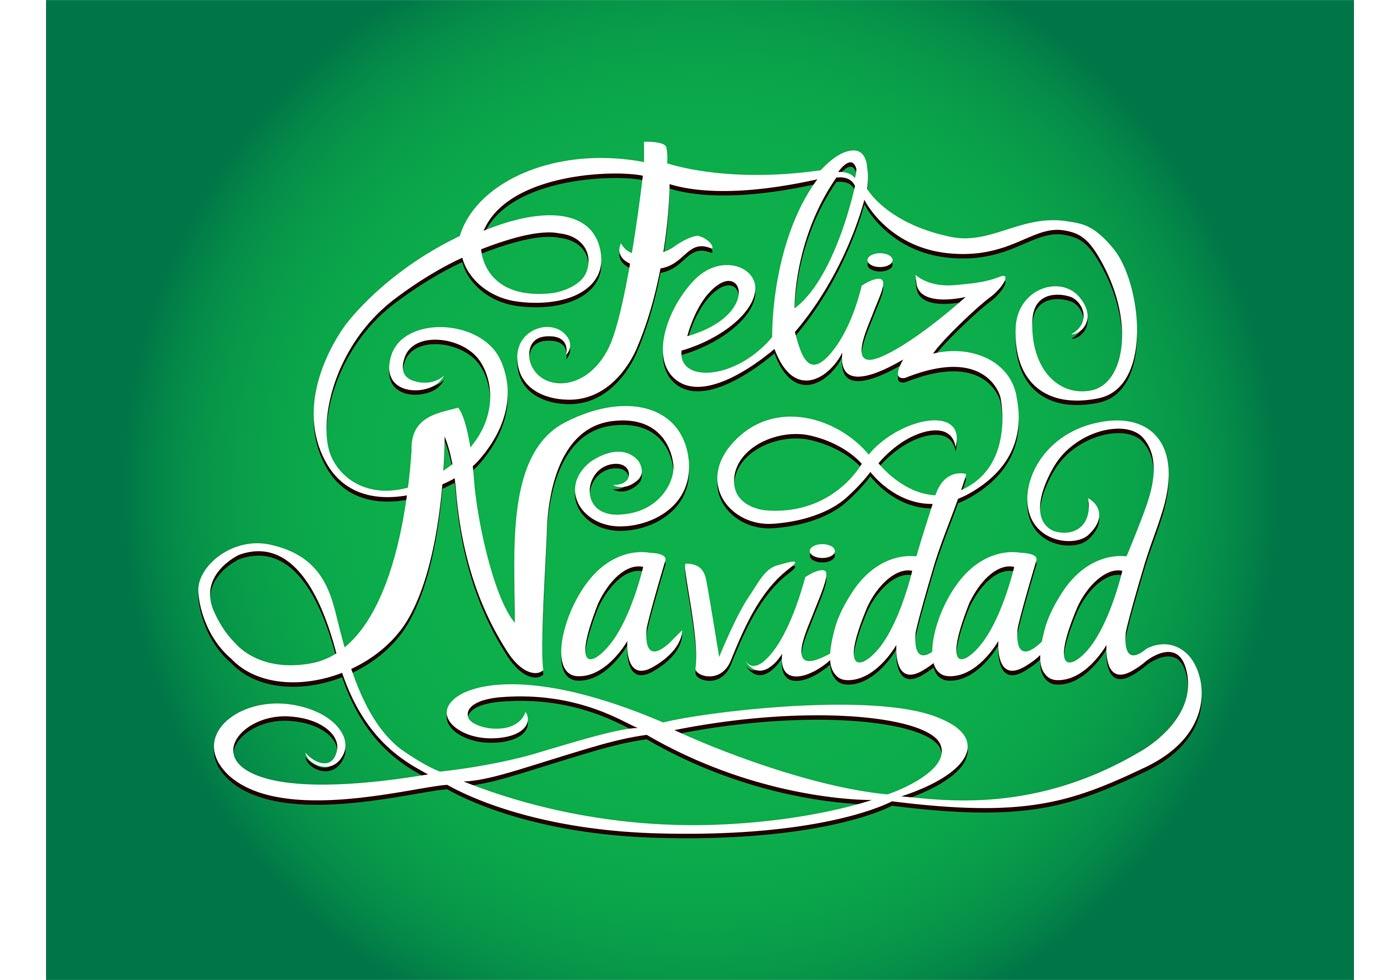 Spanish Christmas Greetings